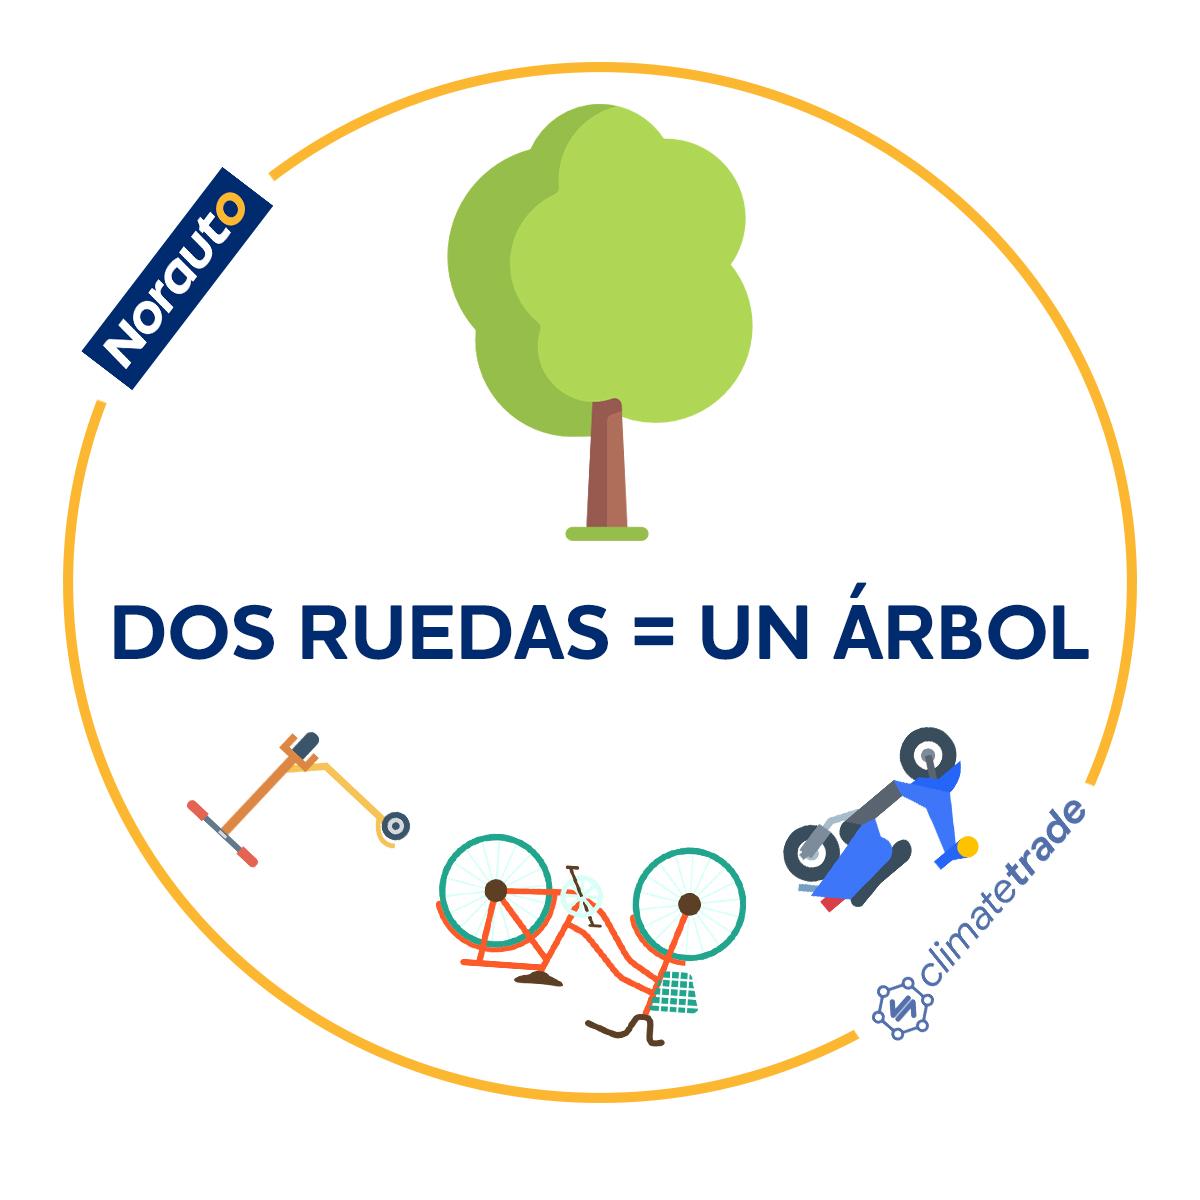 Una bici = un Arbol